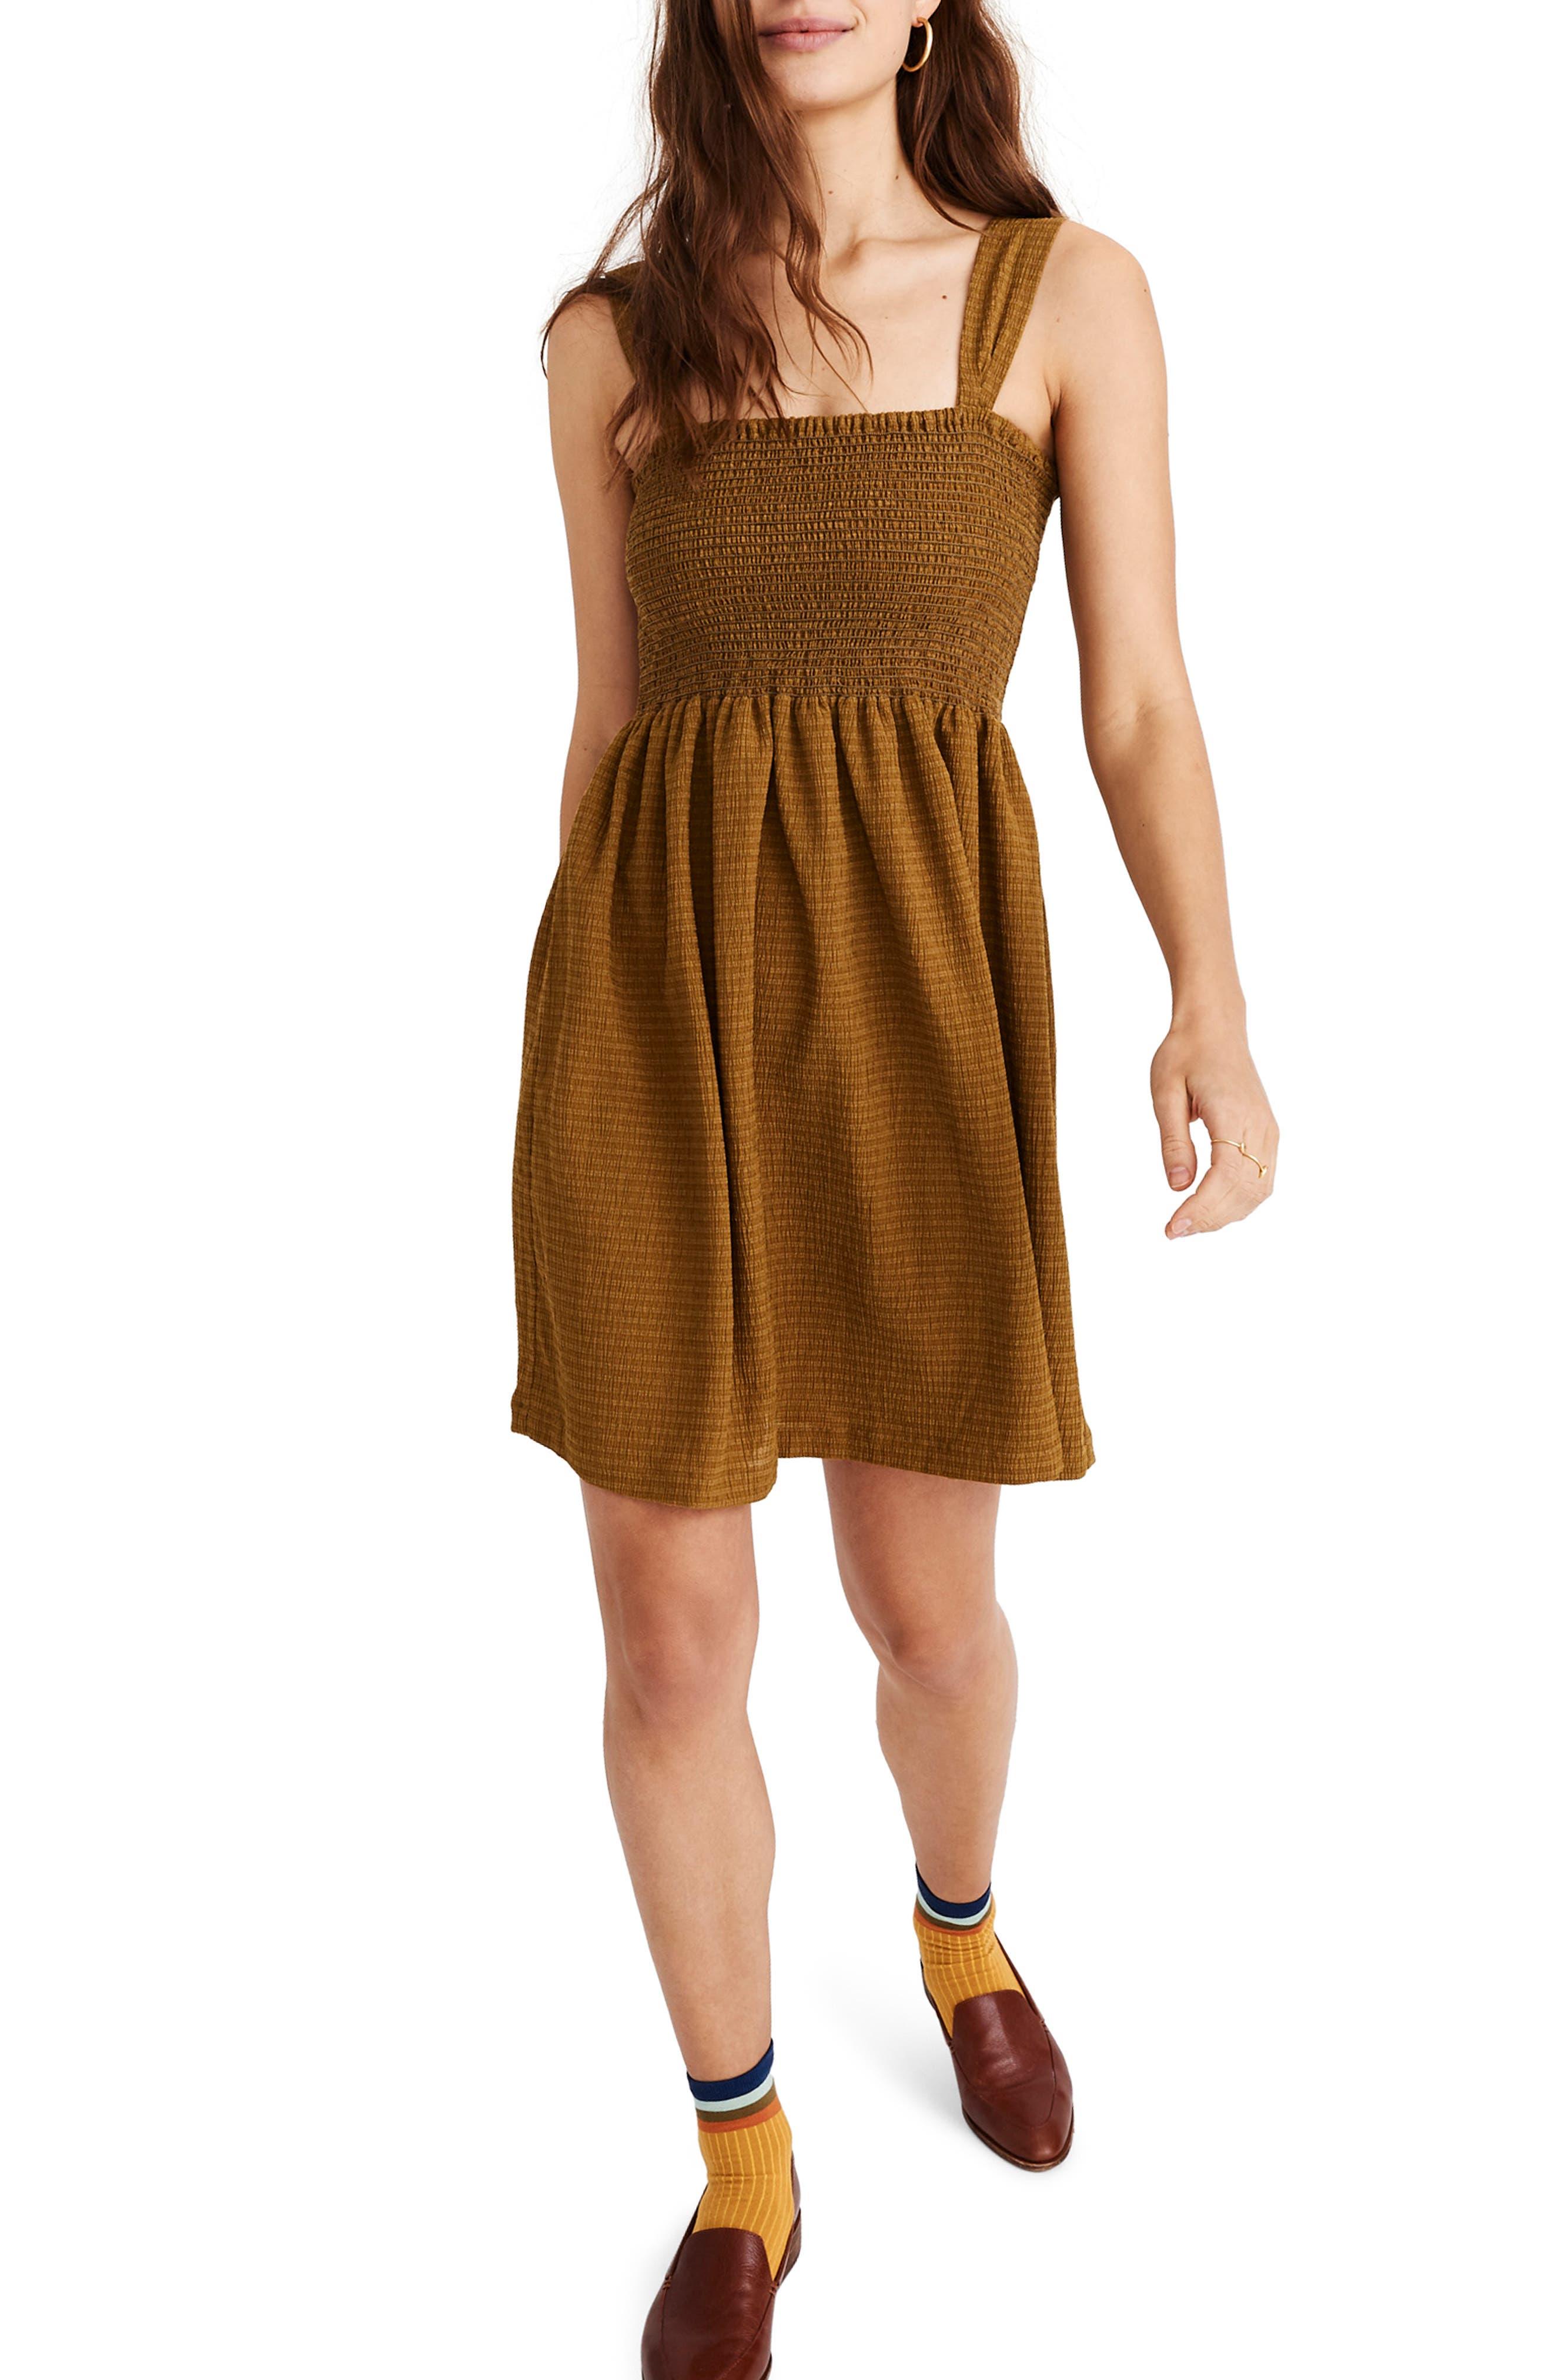 Madewell Texture & Thread Smocked Dress, Green